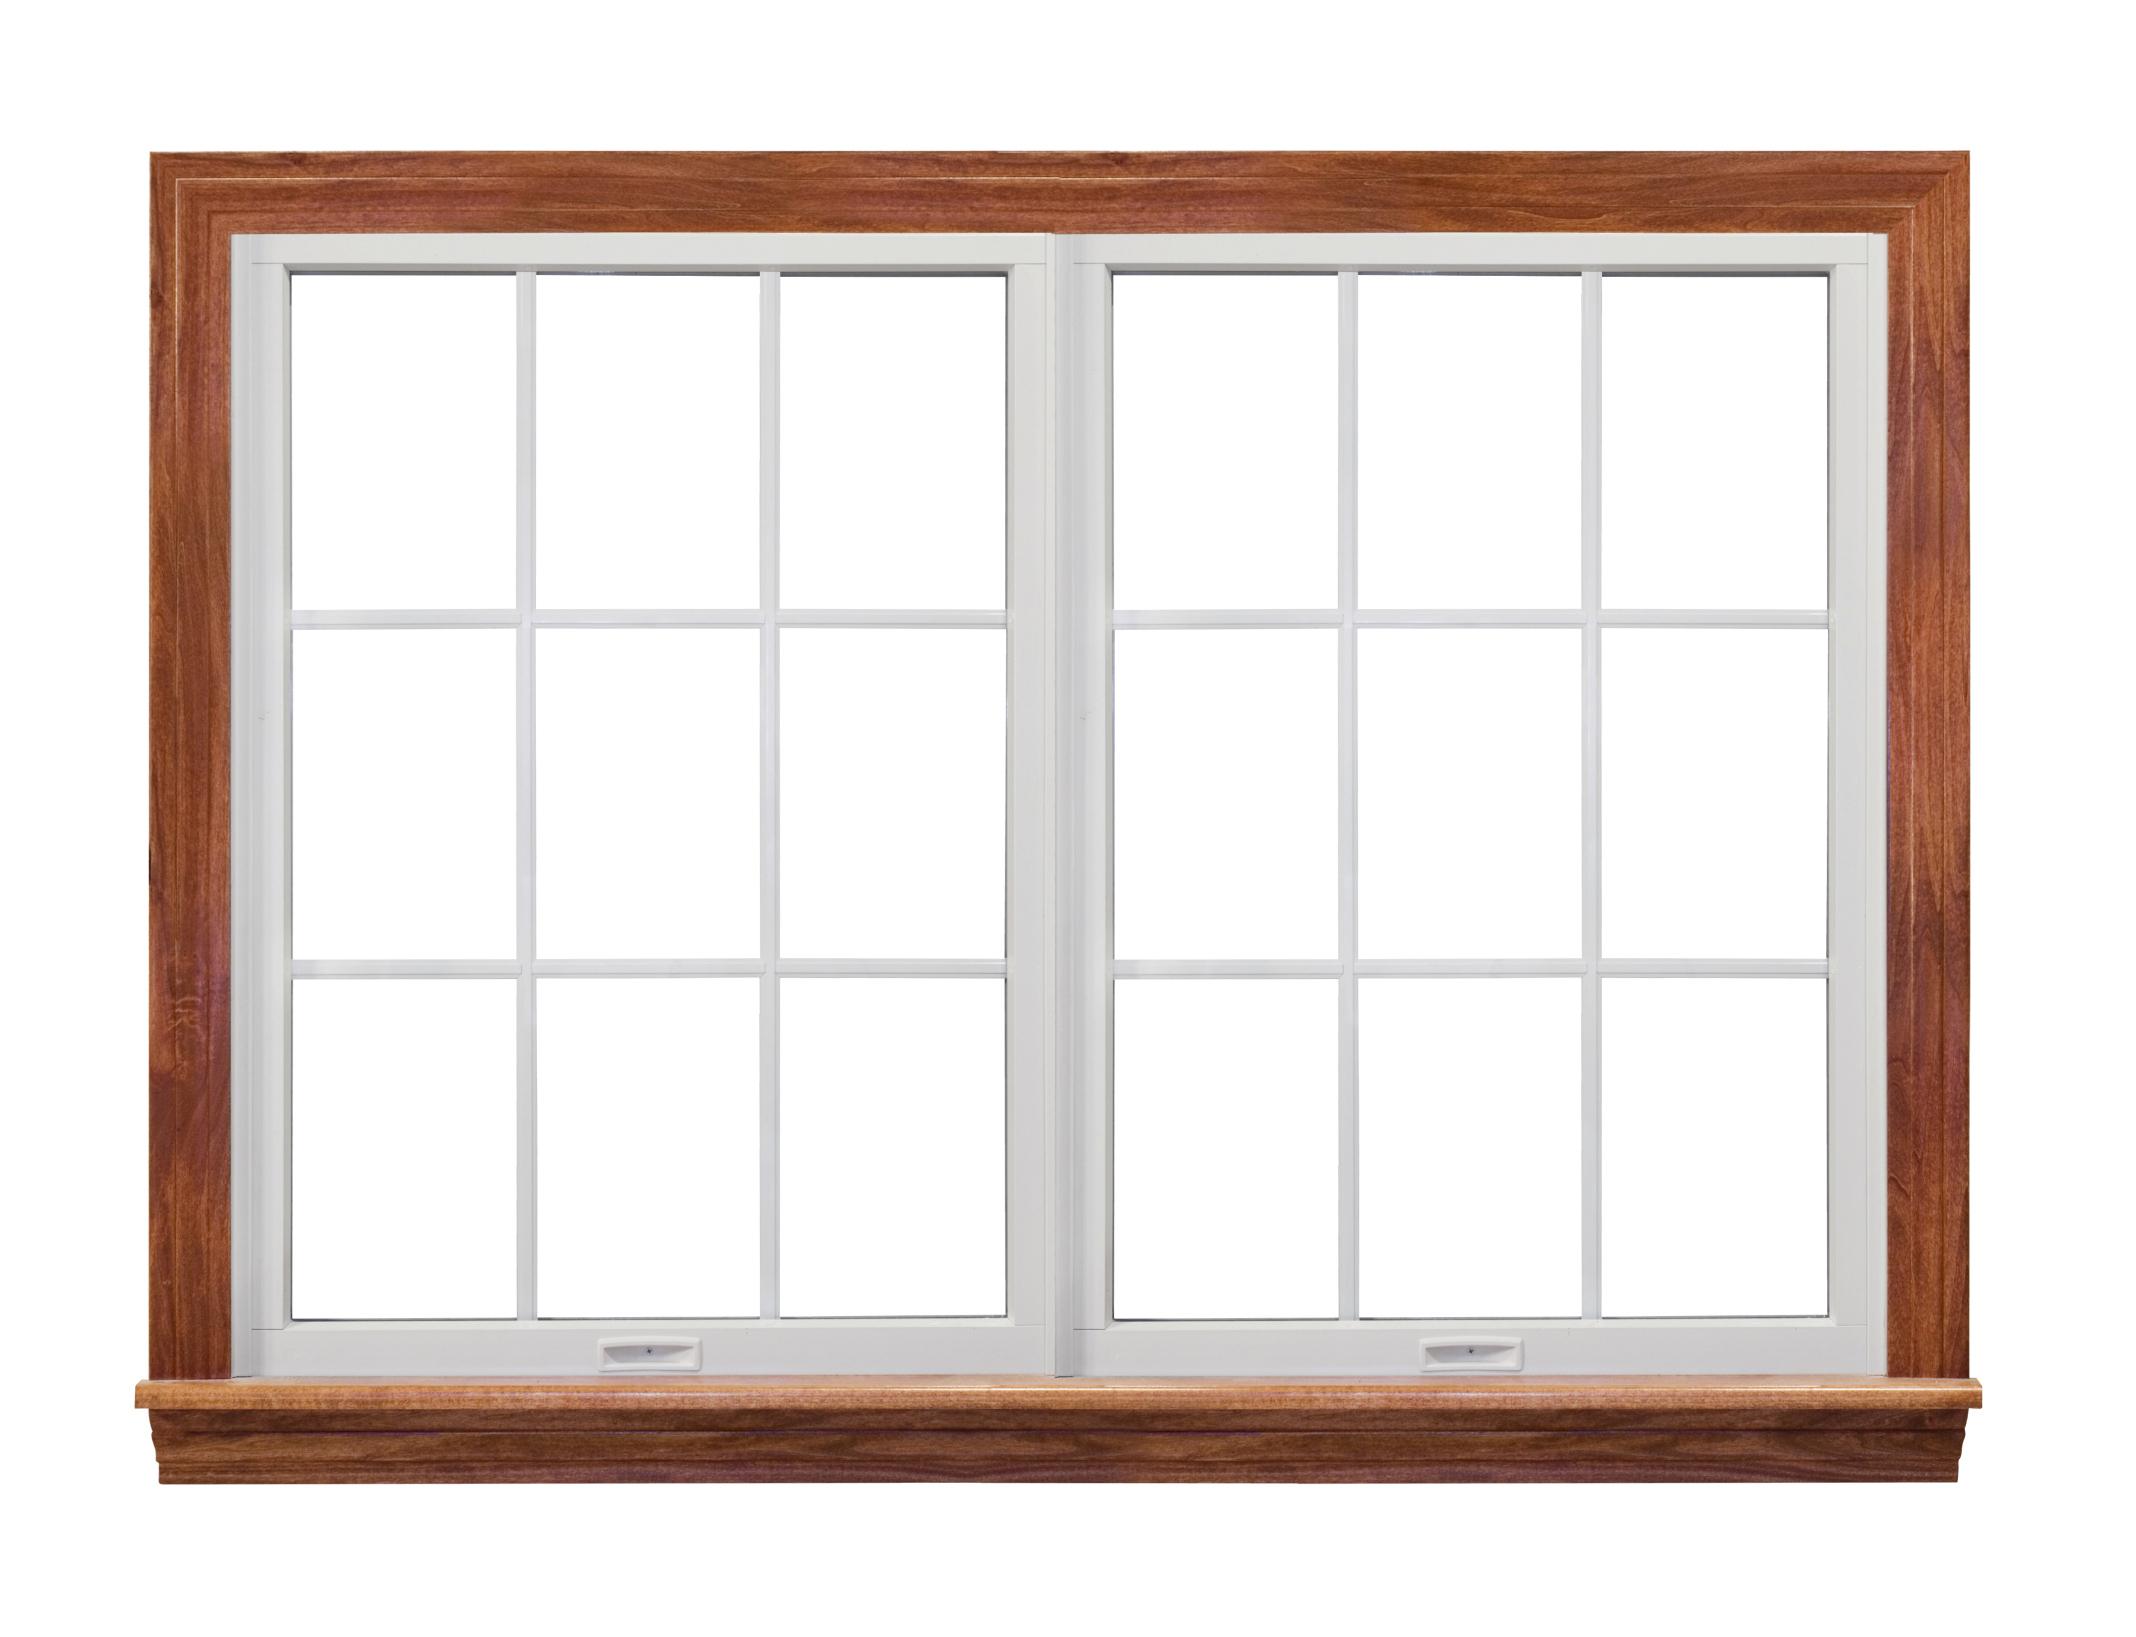 High Resolution Wallpaper   Window 2136x1637 px